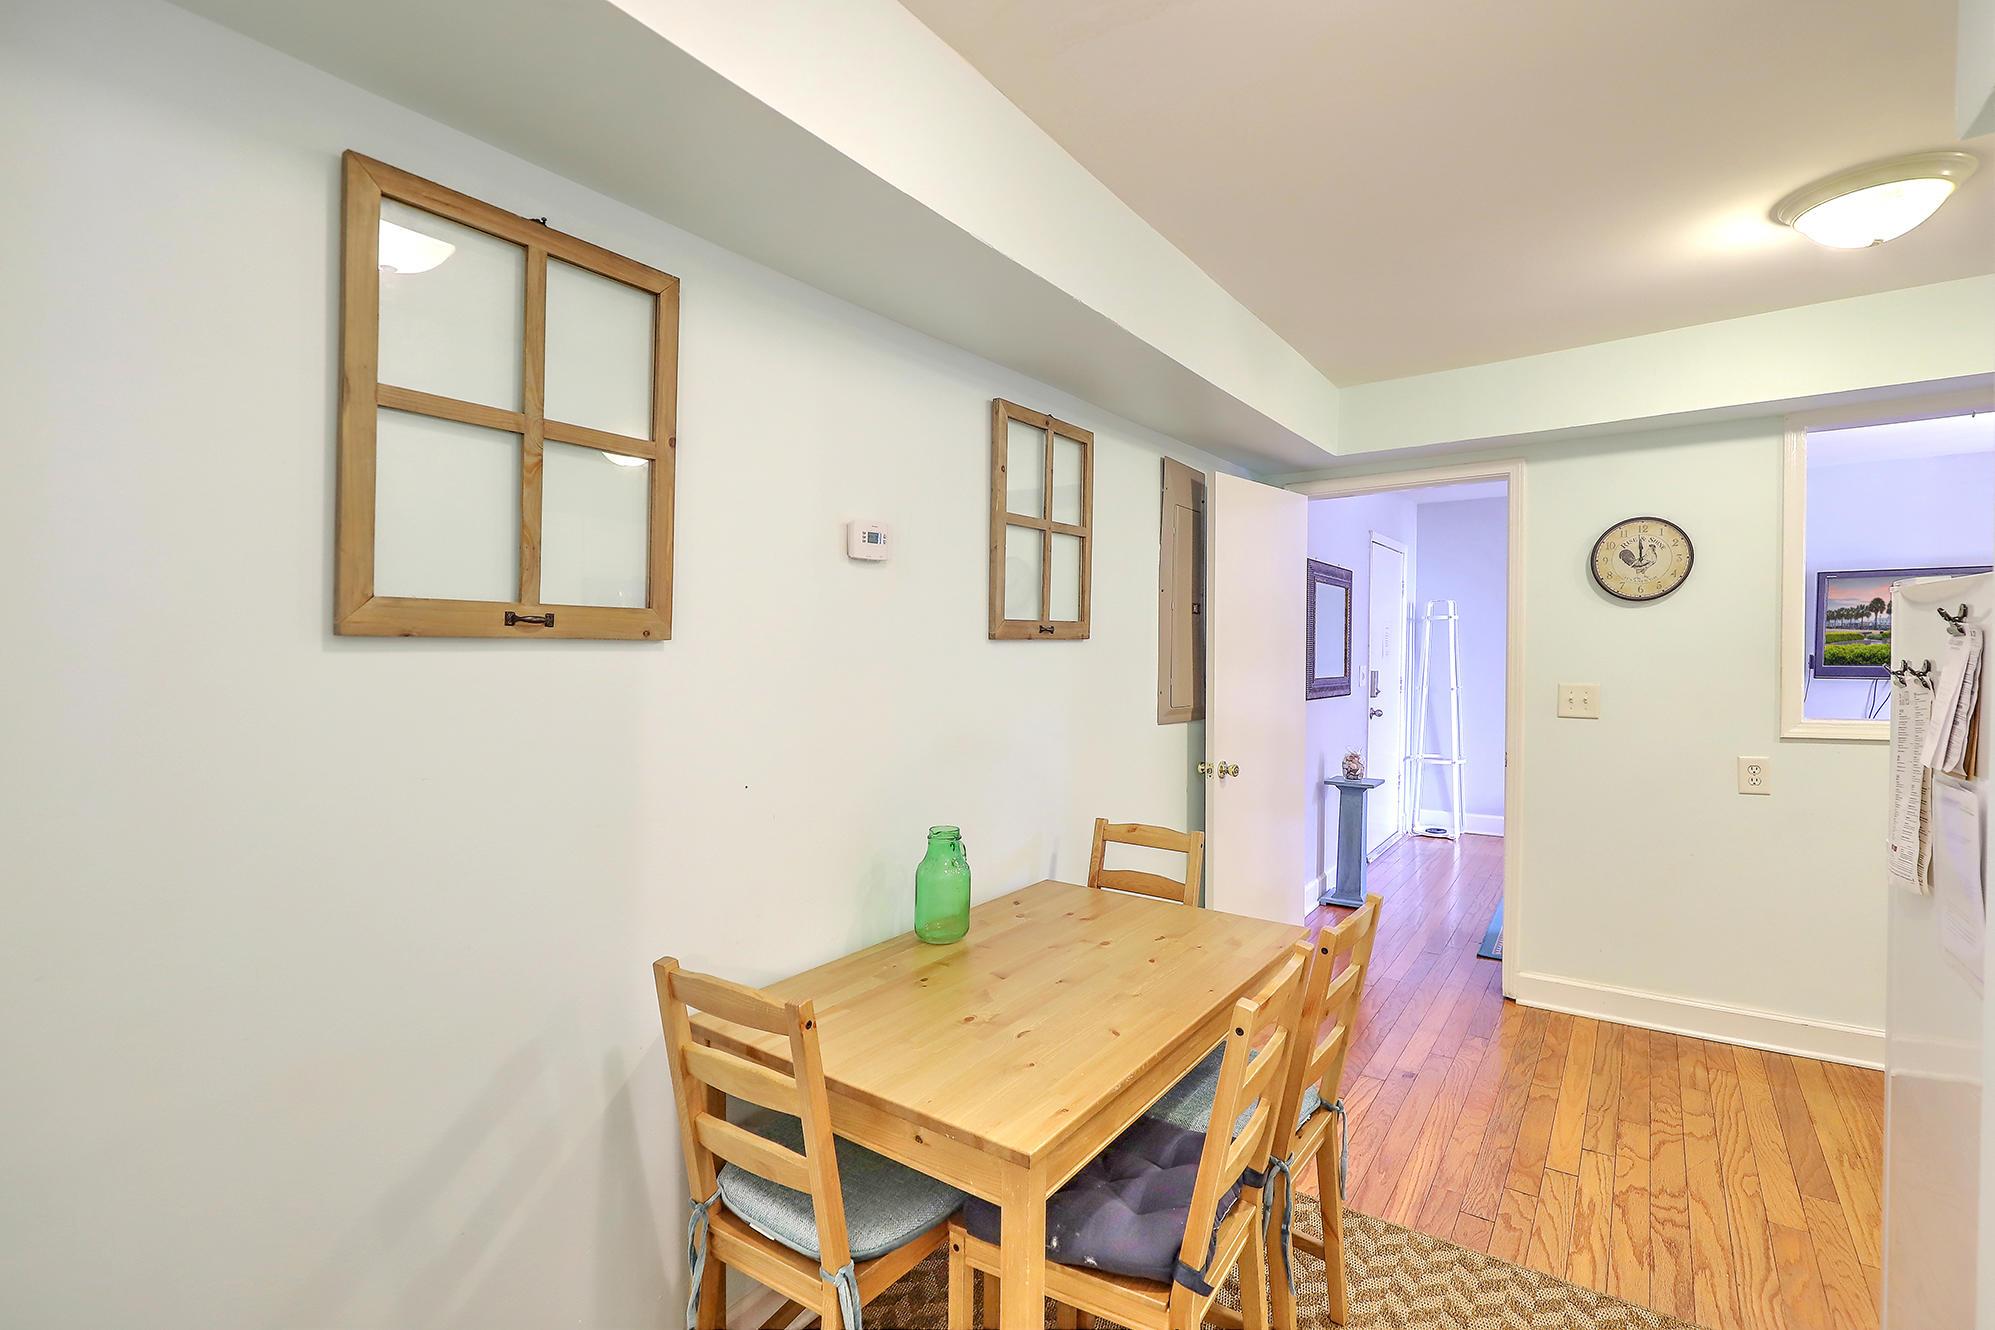 Marsh Grass Condominiums Homes For Sale - 1501 Ben Sawyer, Mount Pleasant, SC - 10